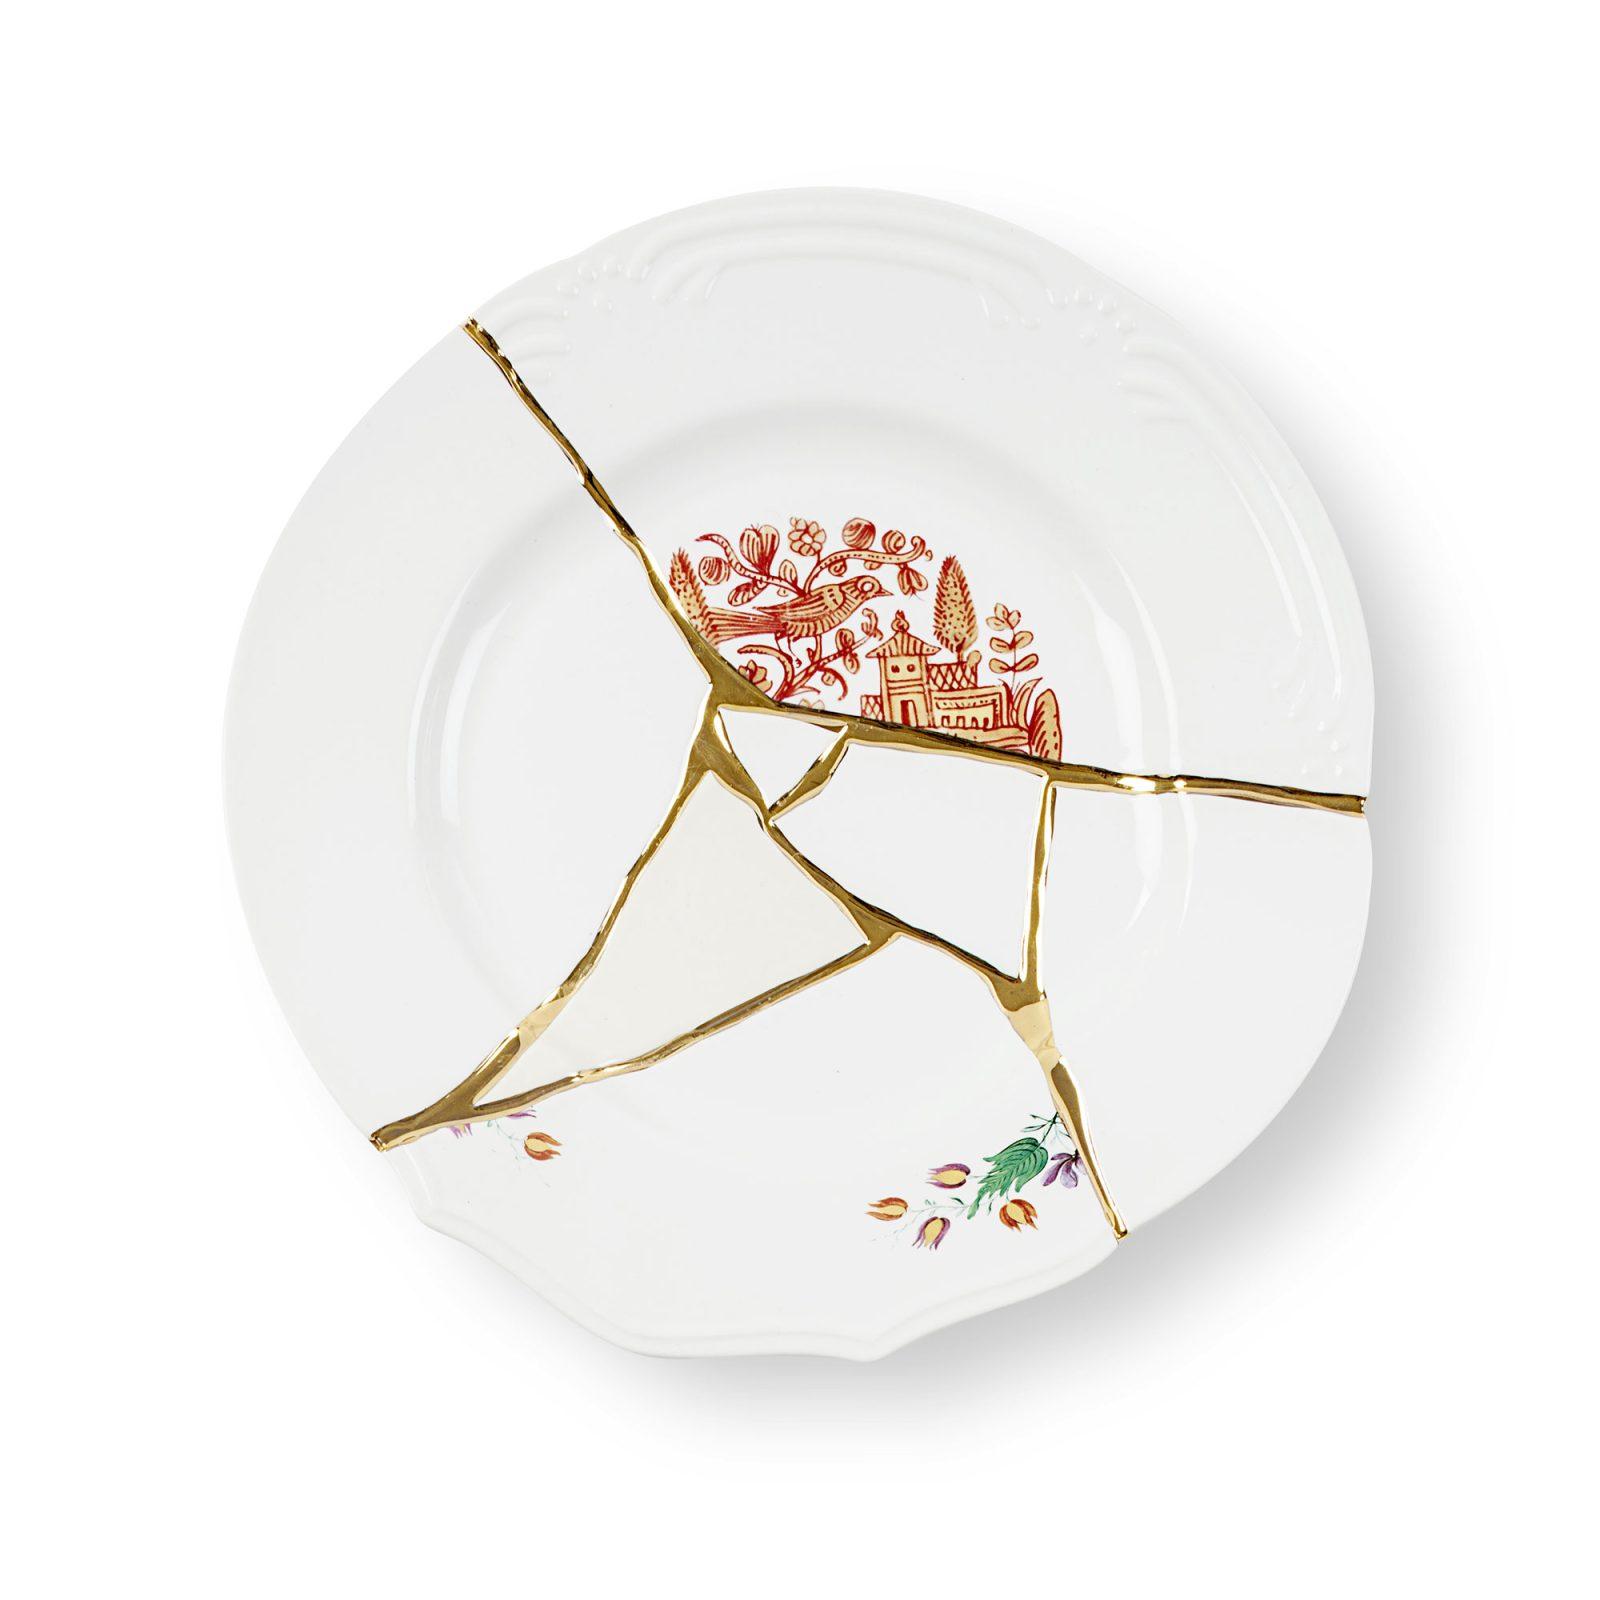 kintsugi-dinner-plate-n-1-2